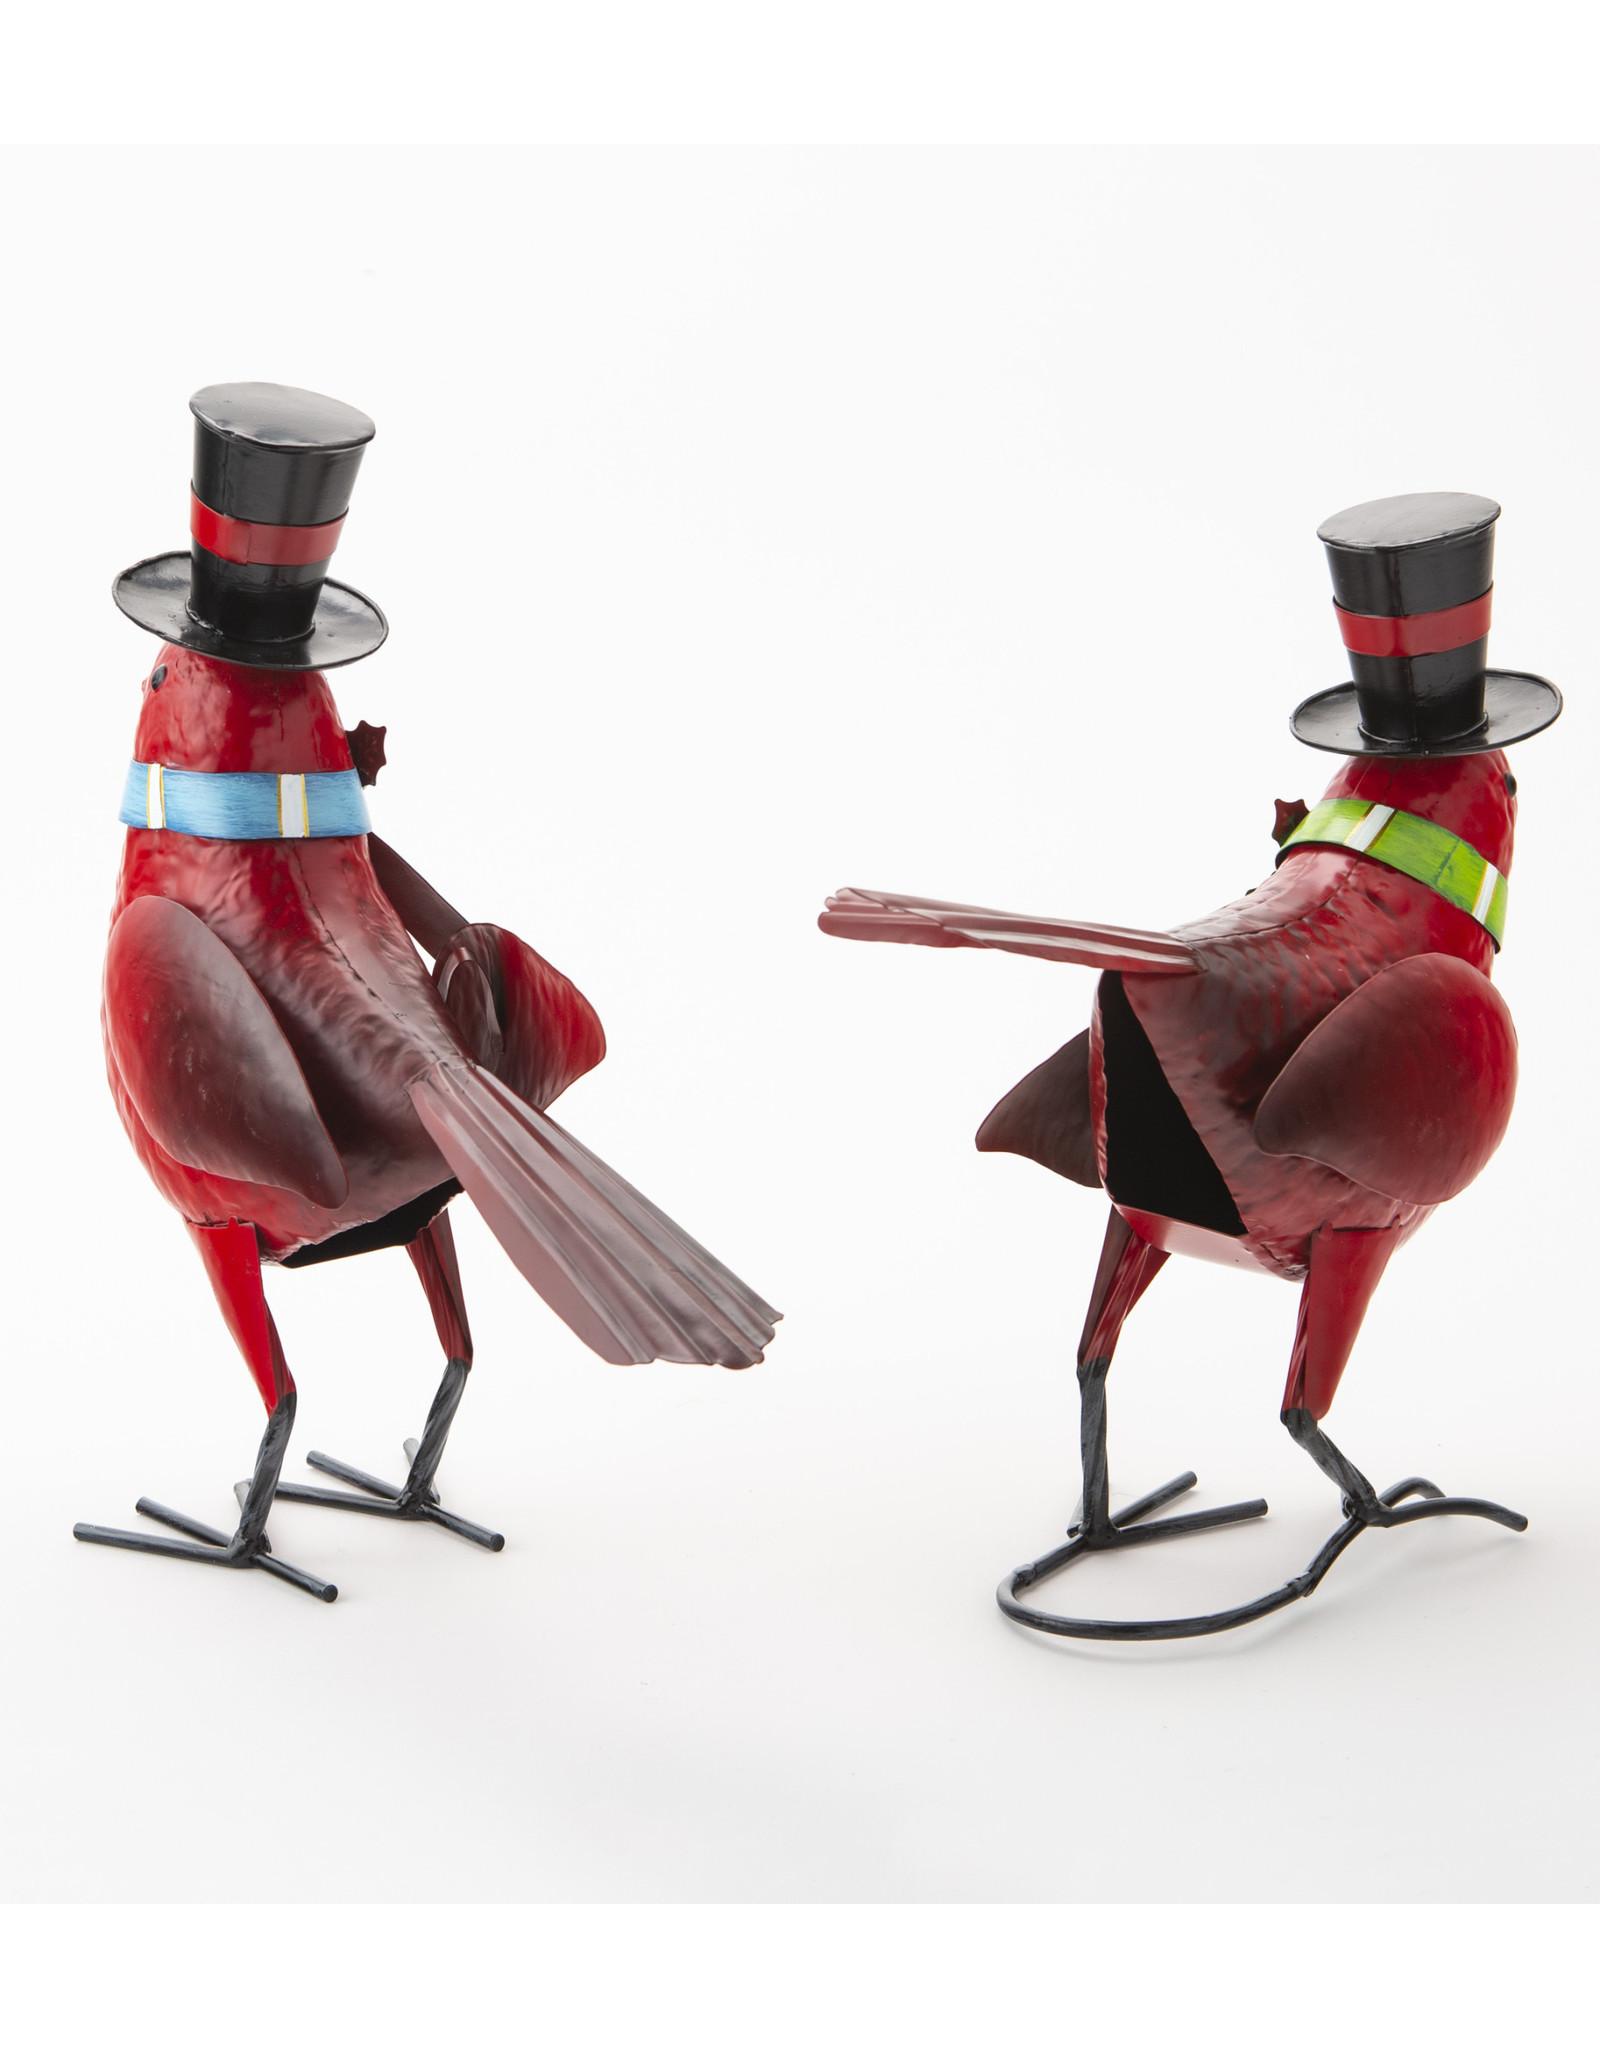 EE55319 Metal Holiday Cardinal Statues Set of 2